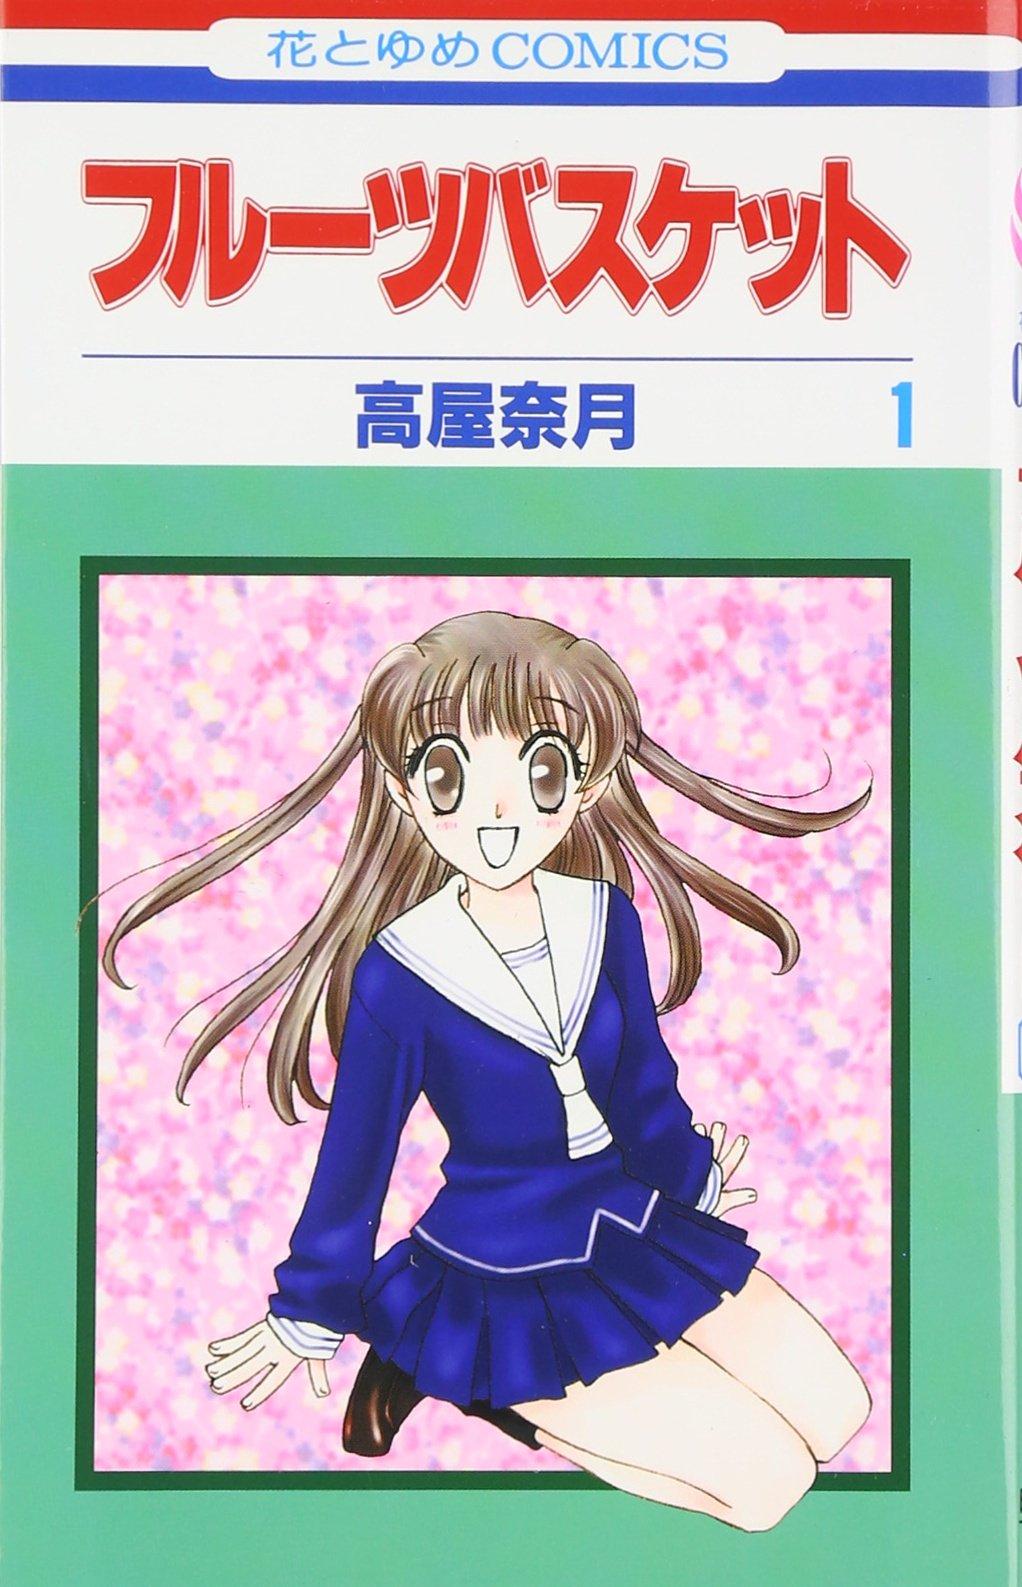 Fruits basket volume 1 japanese edition natsuki takaya 9784592171614 amazon com books